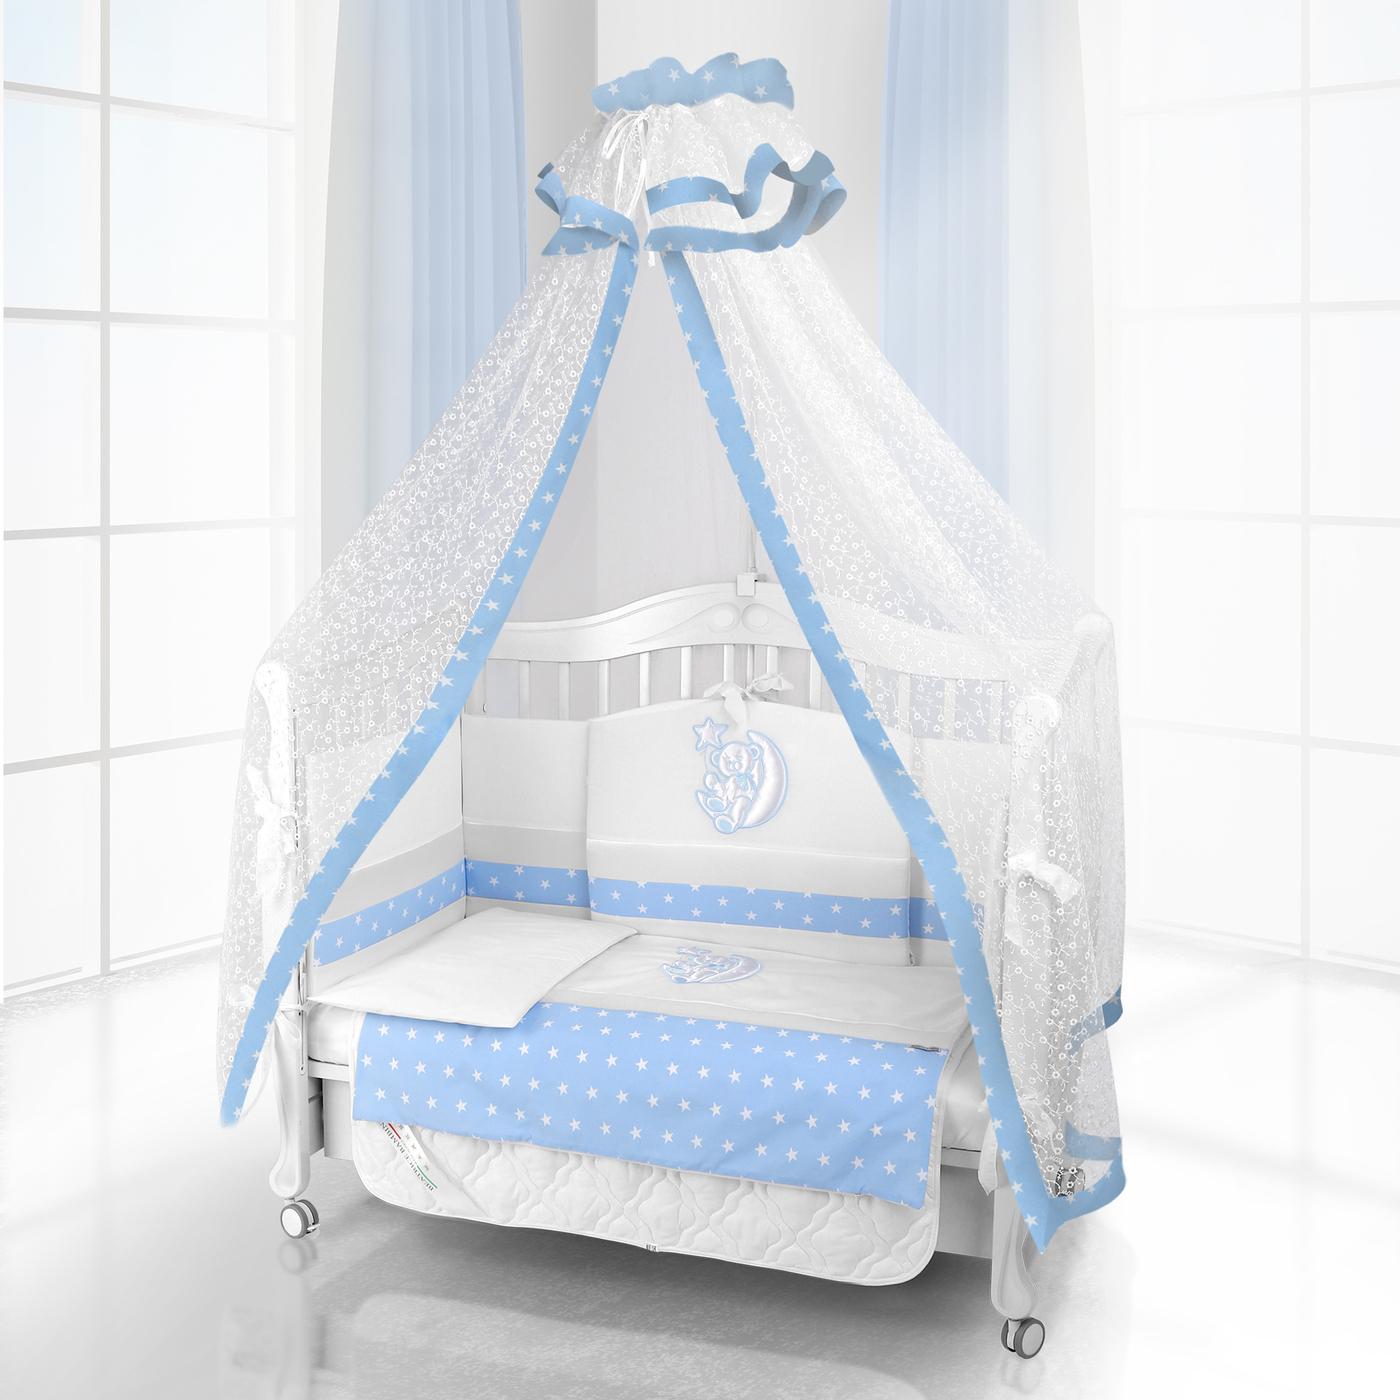 Комплект постельного белья Beatrice Bambini Unico Stella (125х65) - bianco& blu